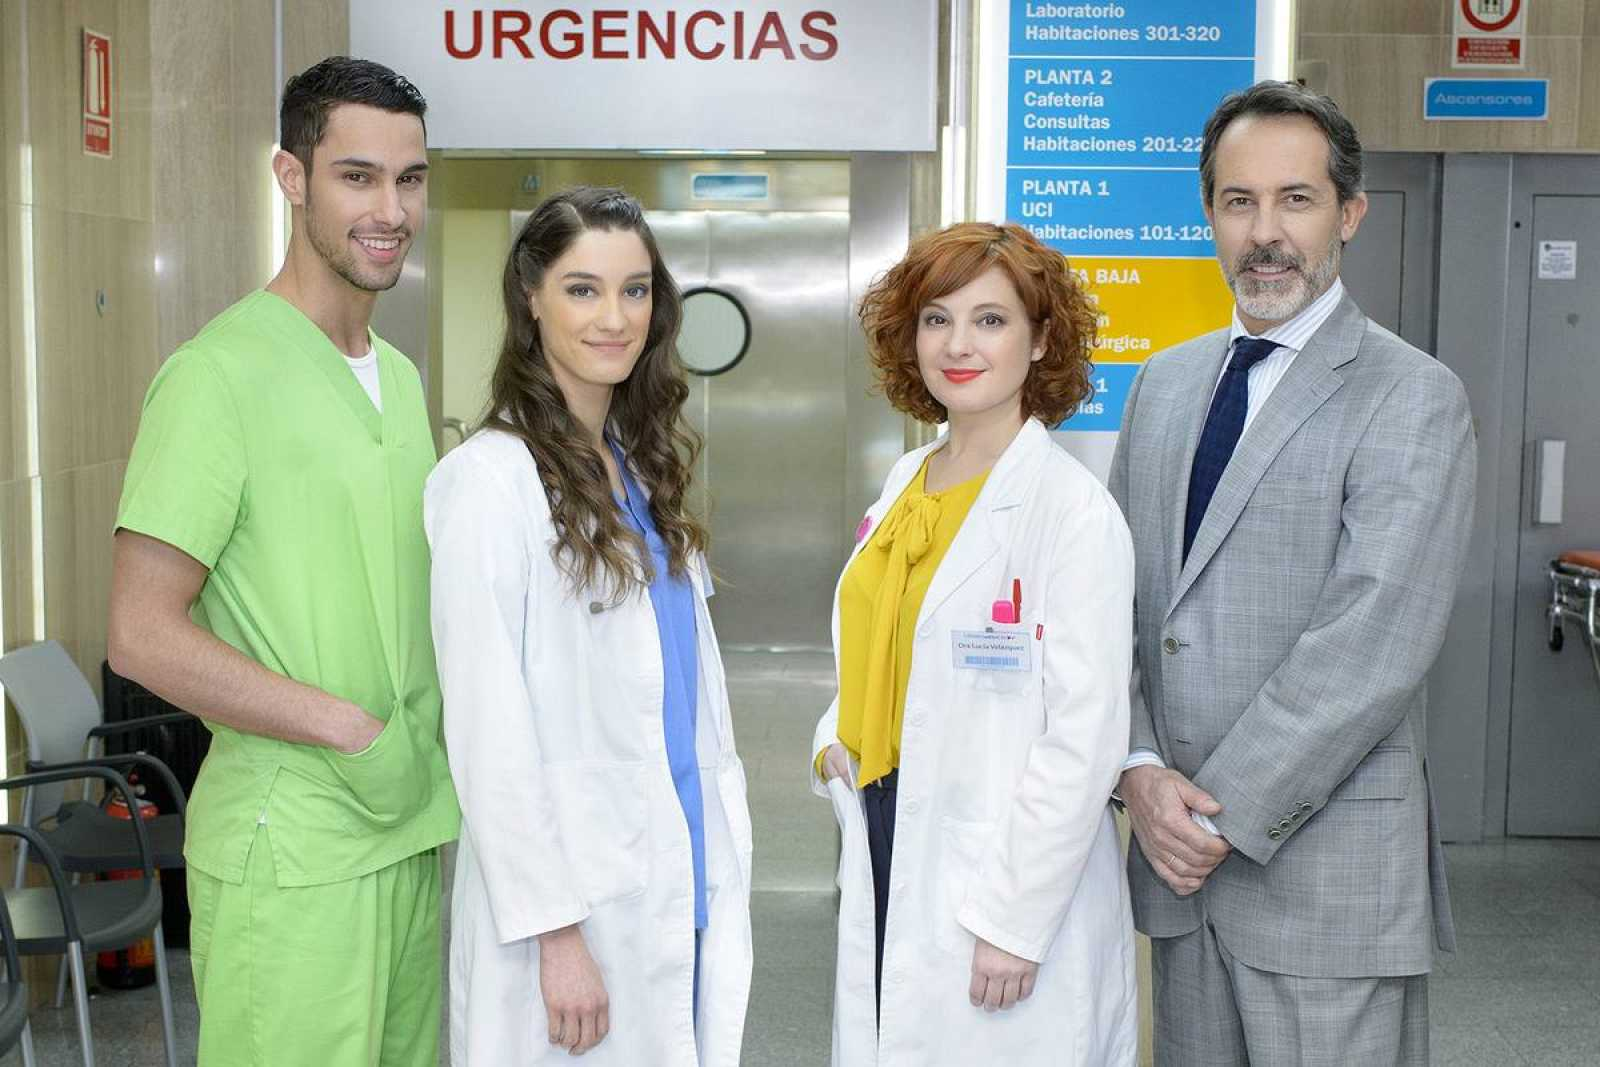 'Centro Médico' recibe nuevos personajes a partir de esta semana